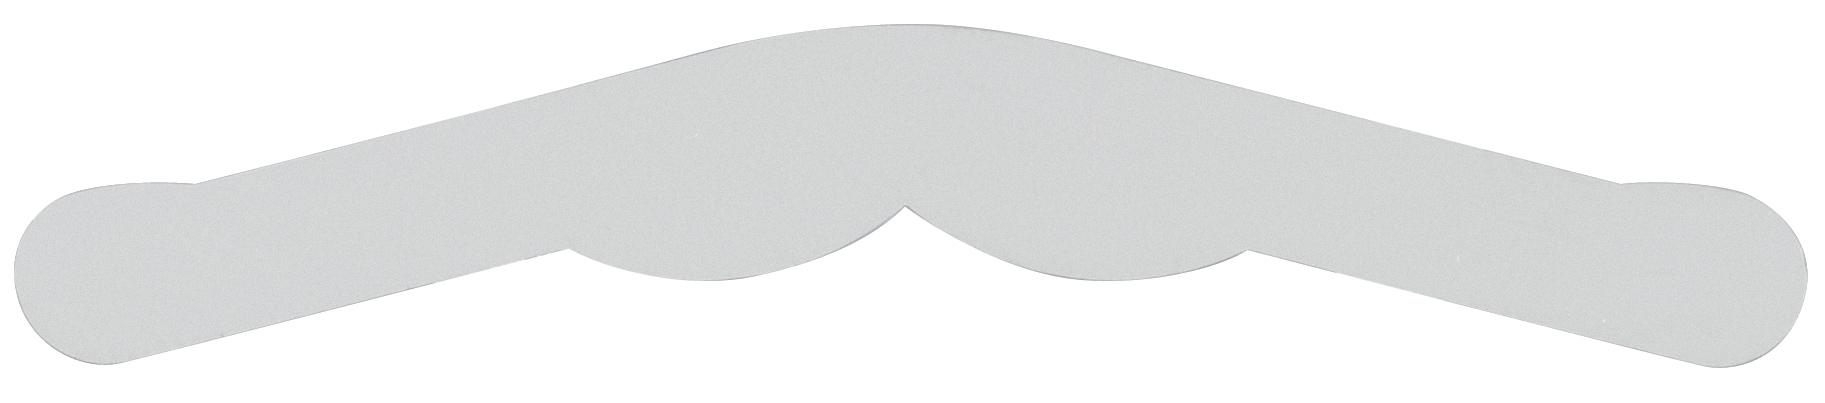 tofflemire-matrix-bands-002-3-72-45-miltex.jpg